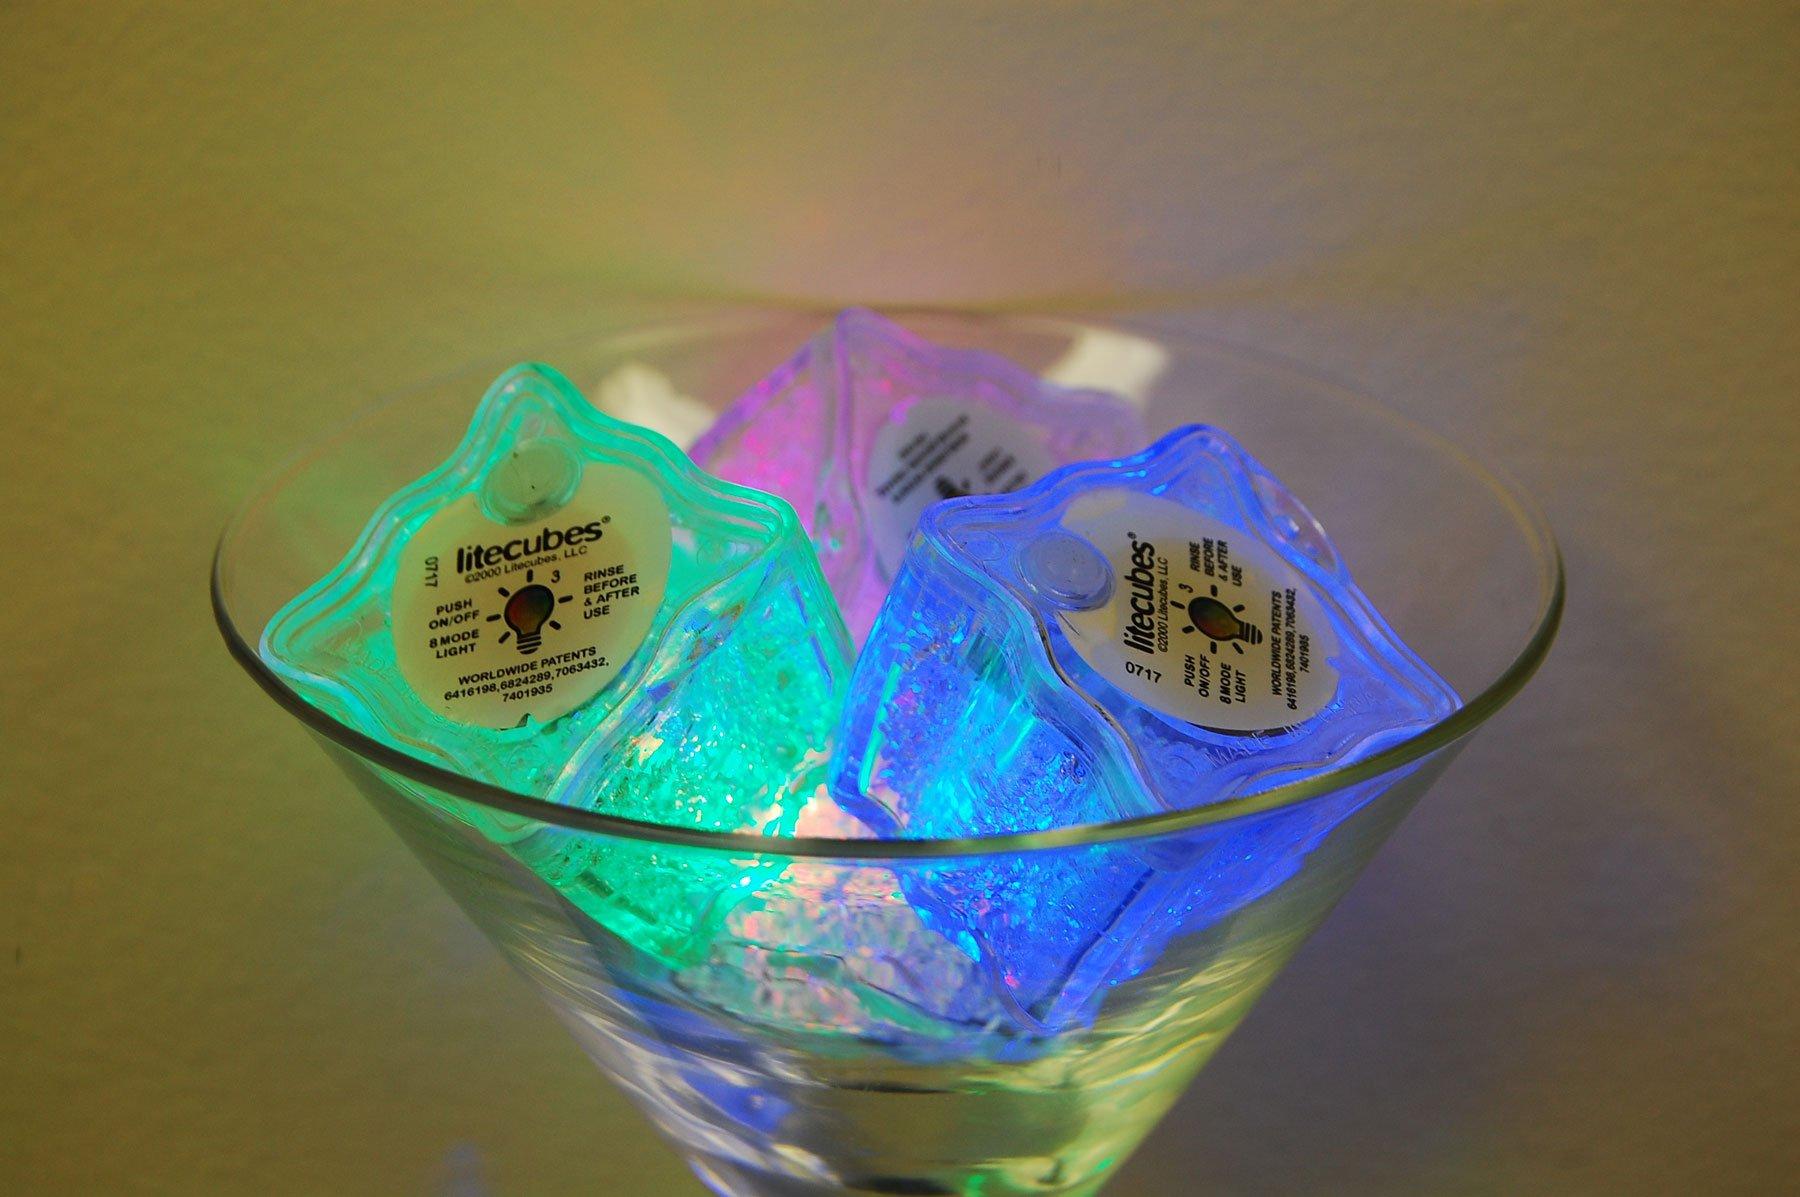 LiteCubes Set of 48 Brand 8 Mode MultiColor RAINBOW Light up LED Ice Cubes … by LiteCubes (Image #5)